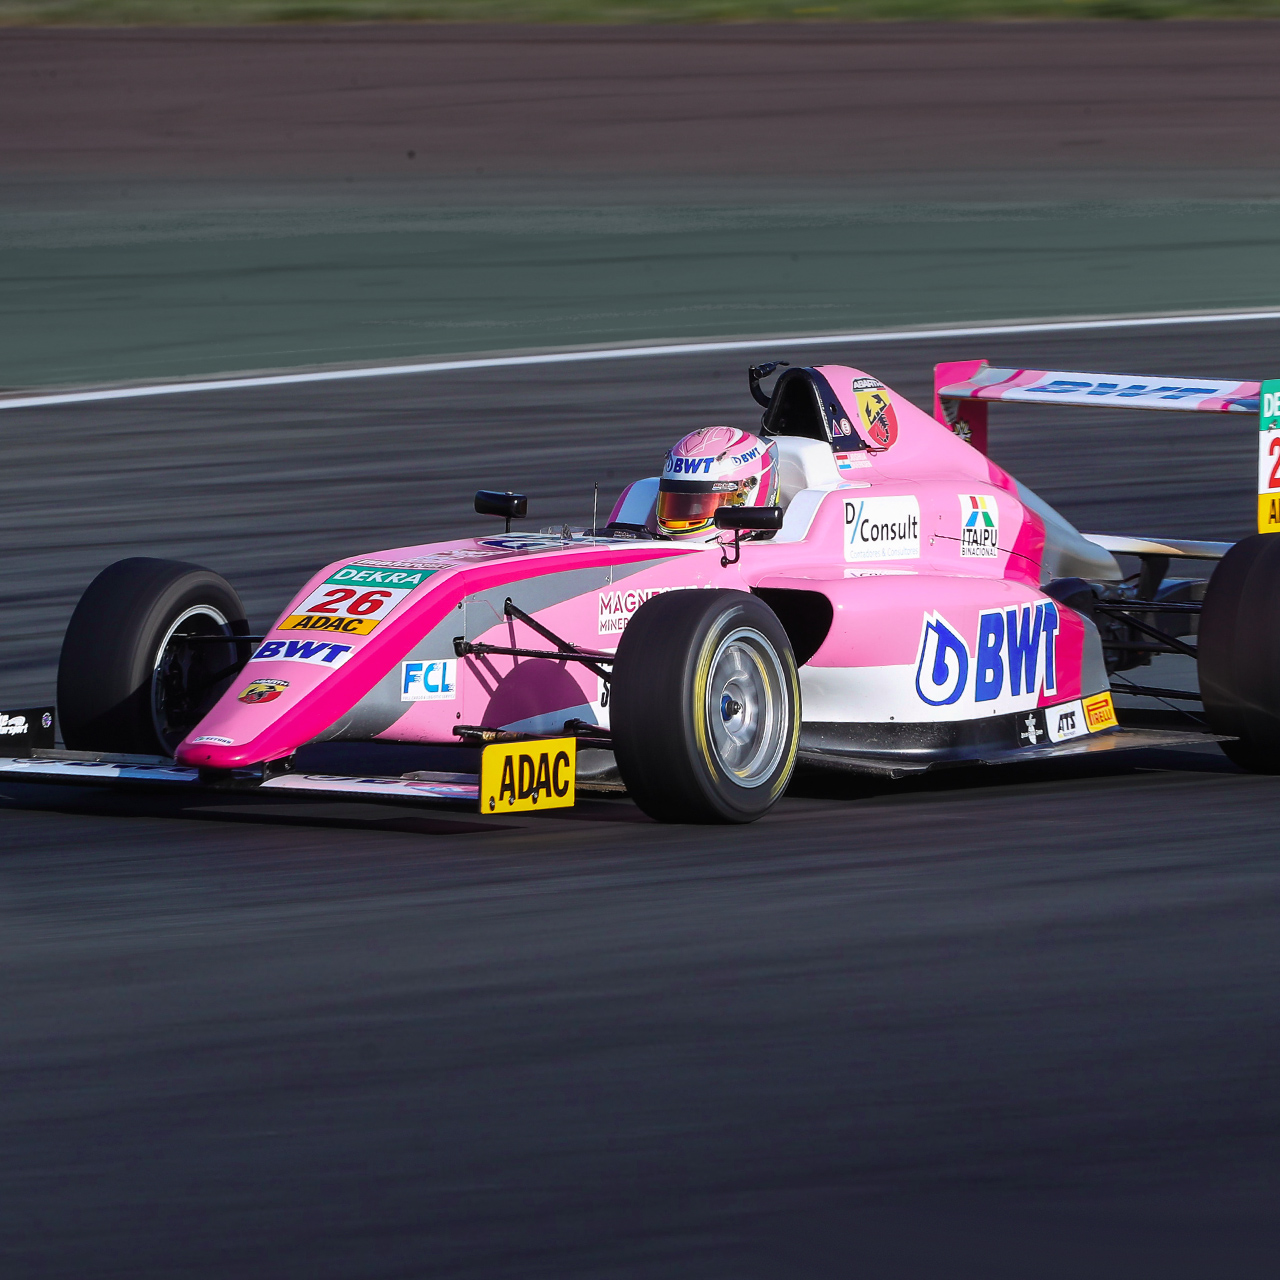 Bwt Motorsport